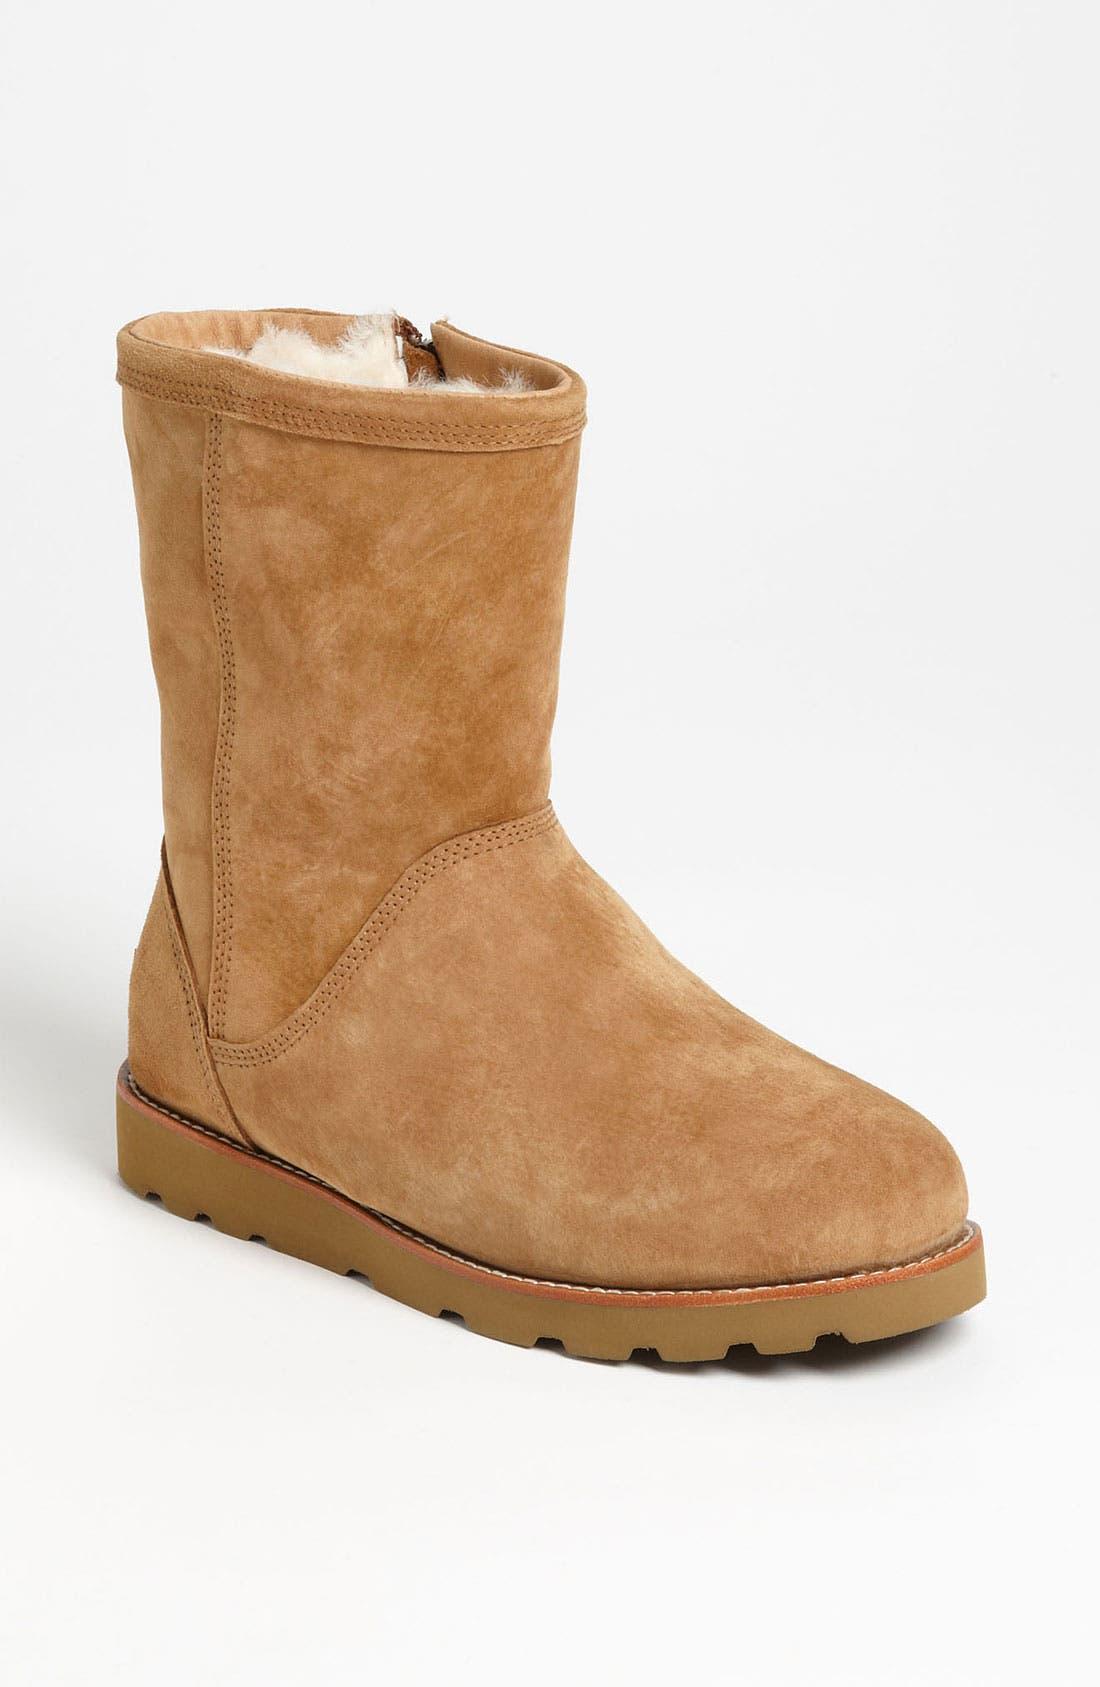 Main Image - UGG® Australia 'Selia' Boot (Women)